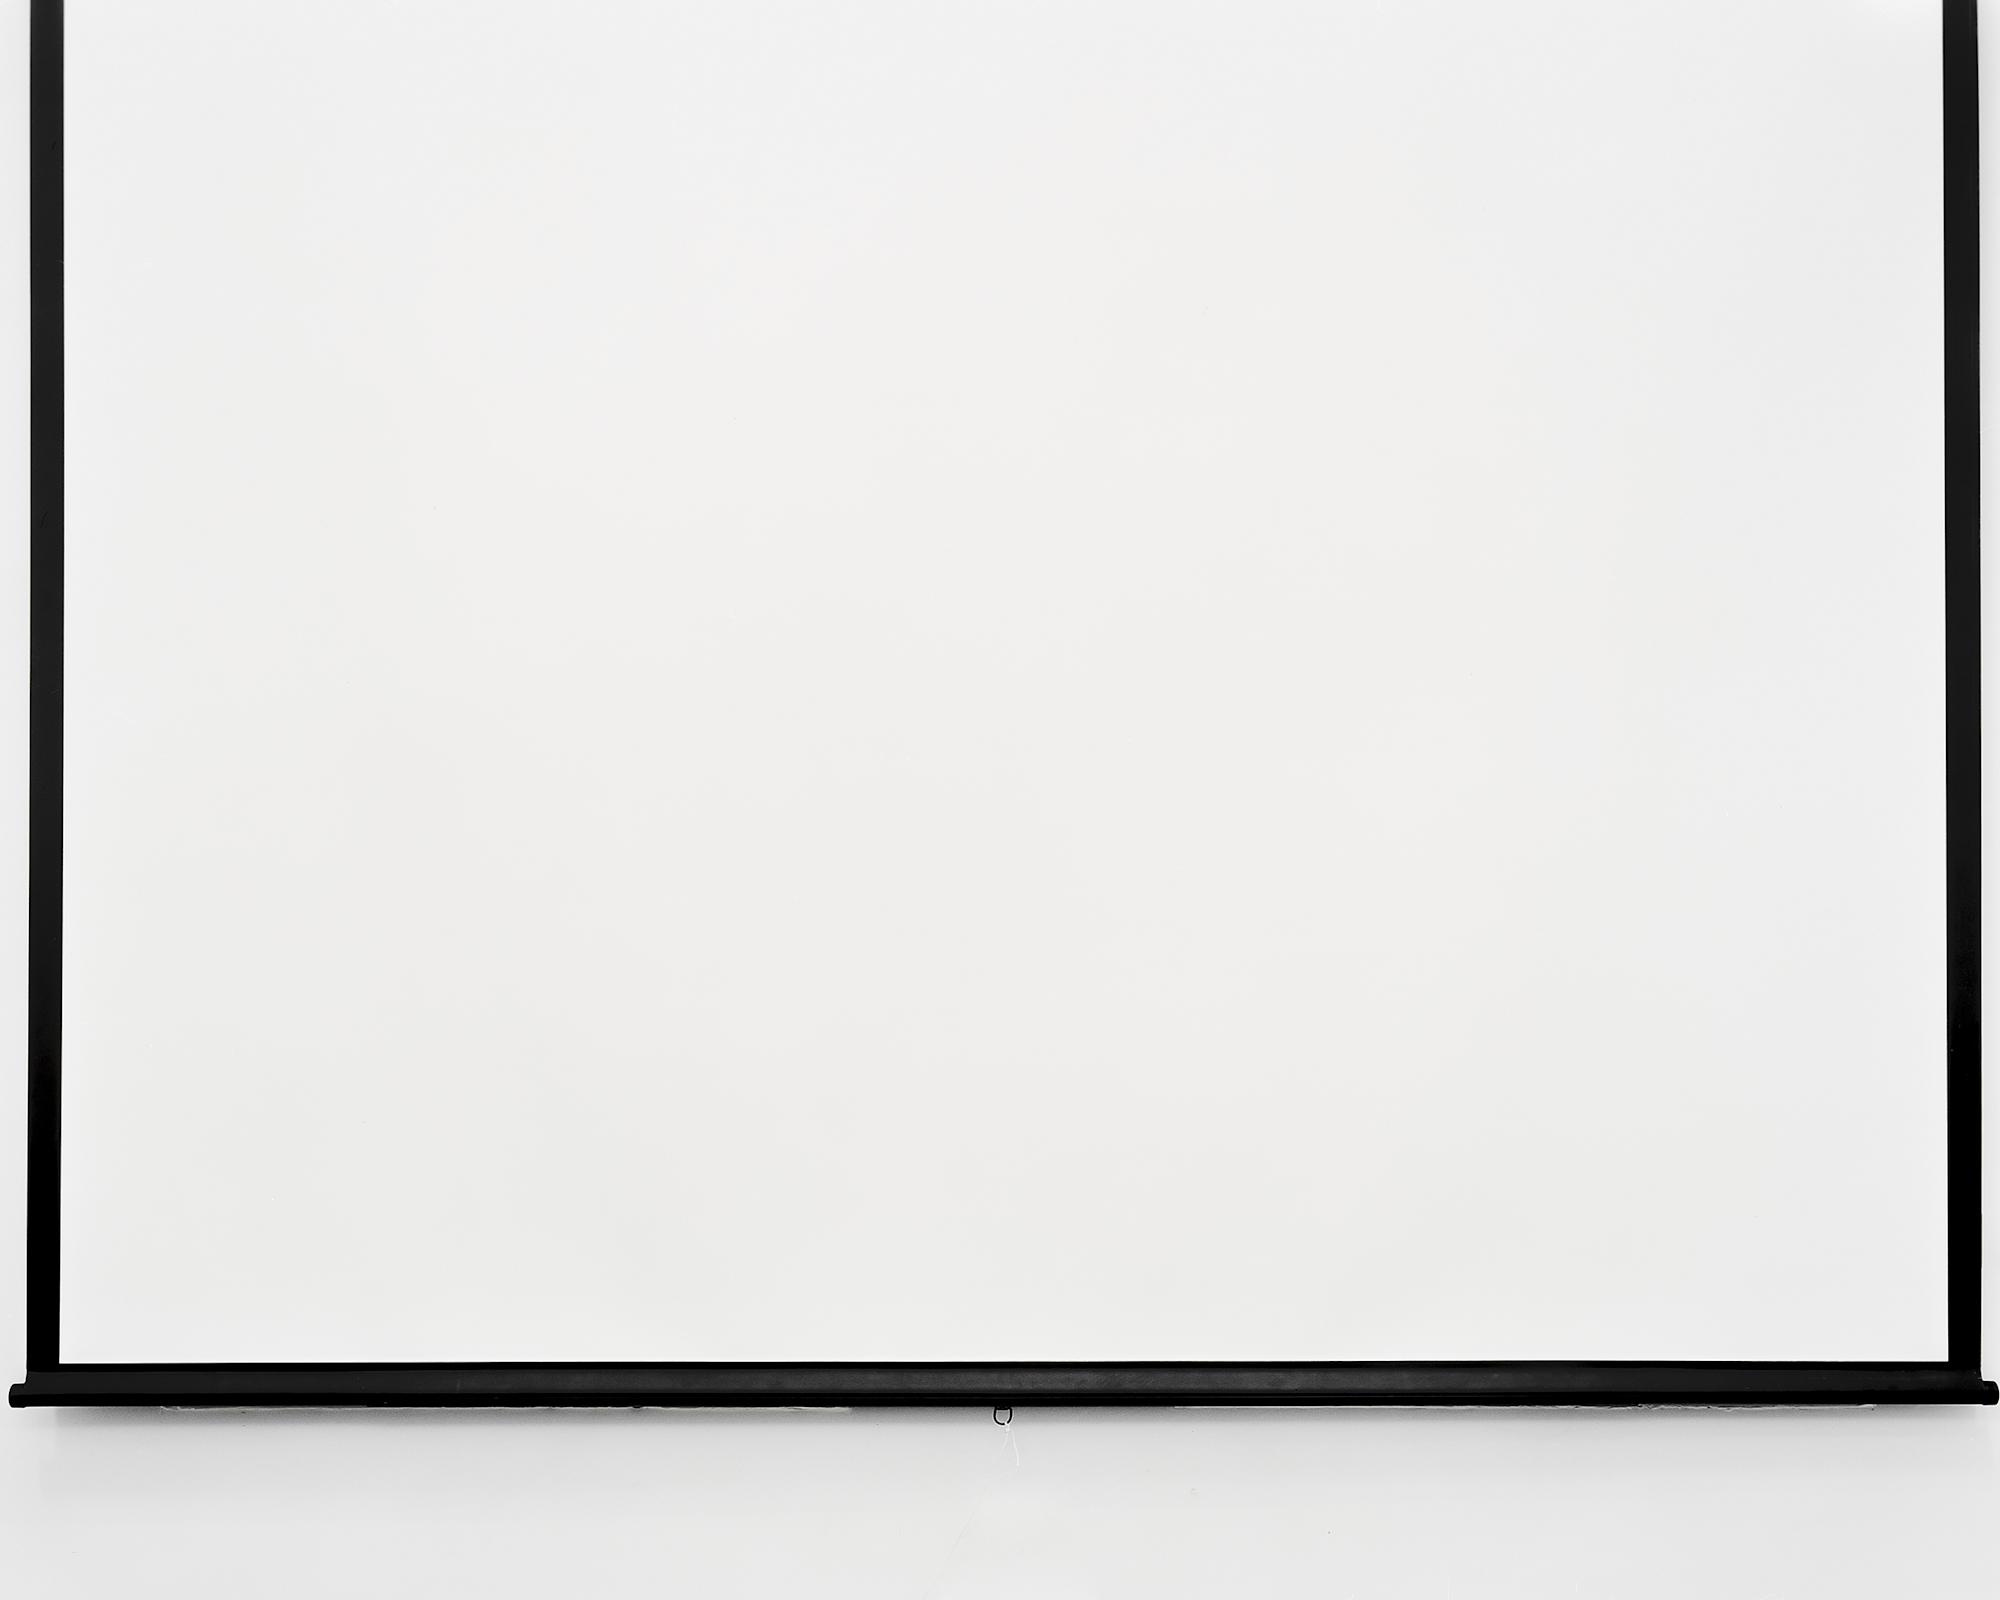 Classroom-3 ,archival pigment print,11 x 14 inches, 2013